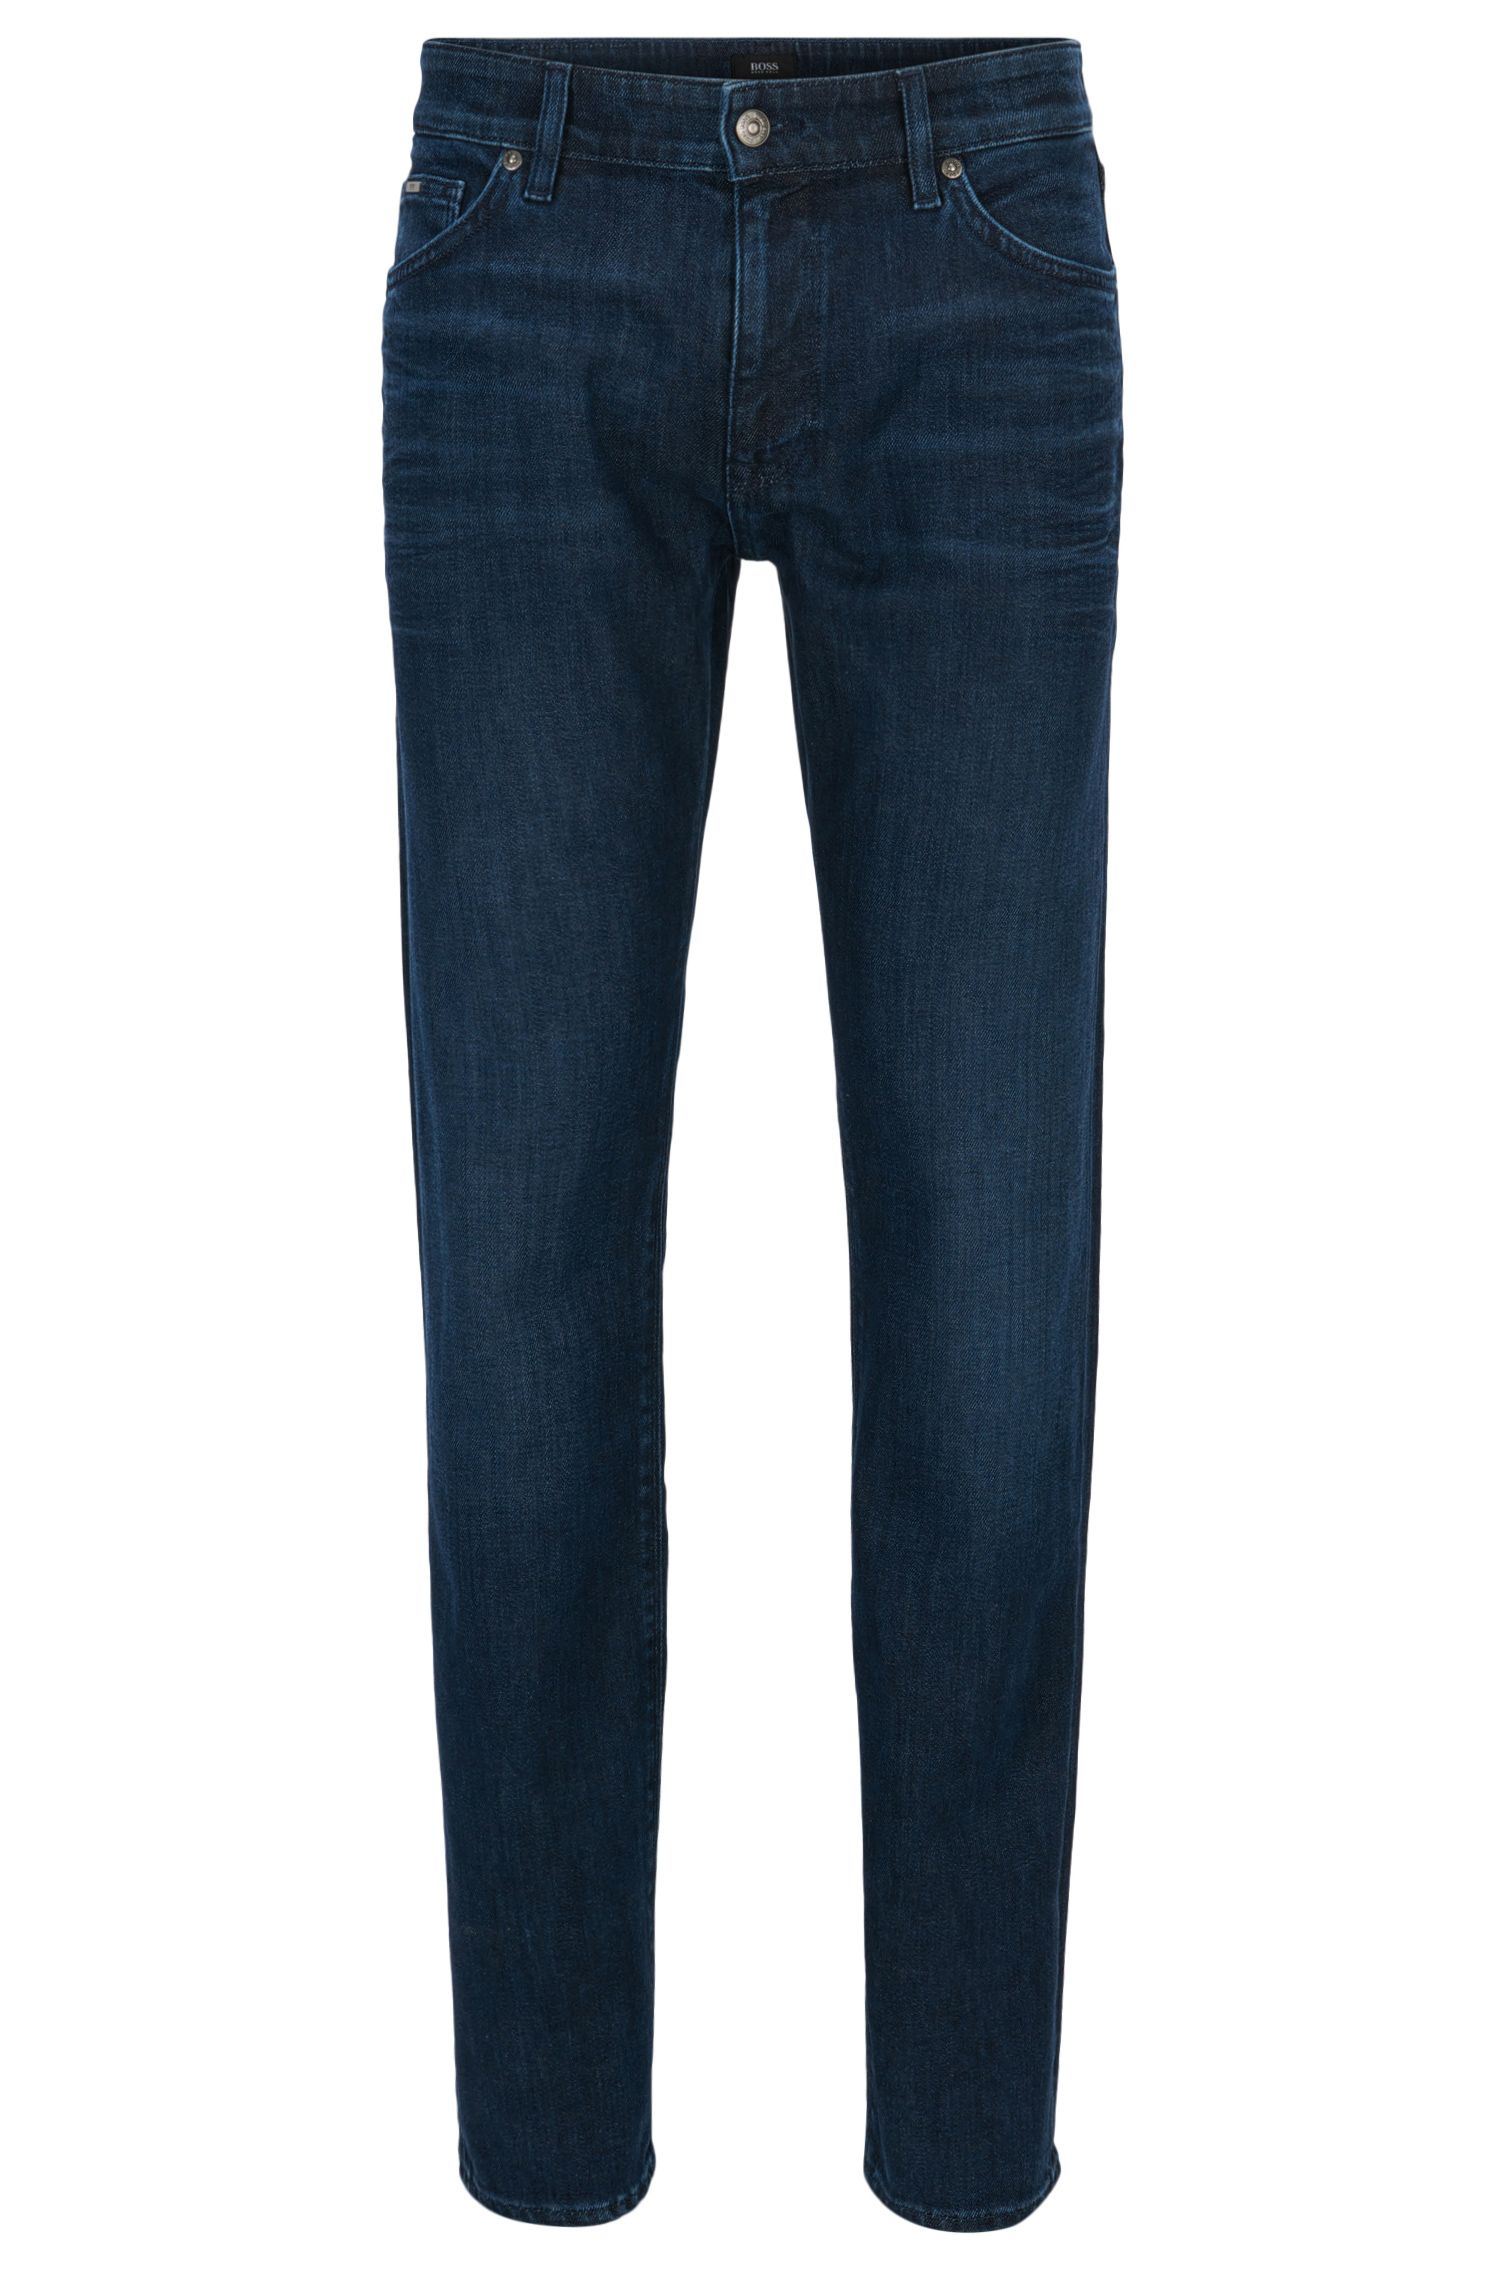 Donkerblauwe regular-fit jeans van stretchdenim met normale wassing